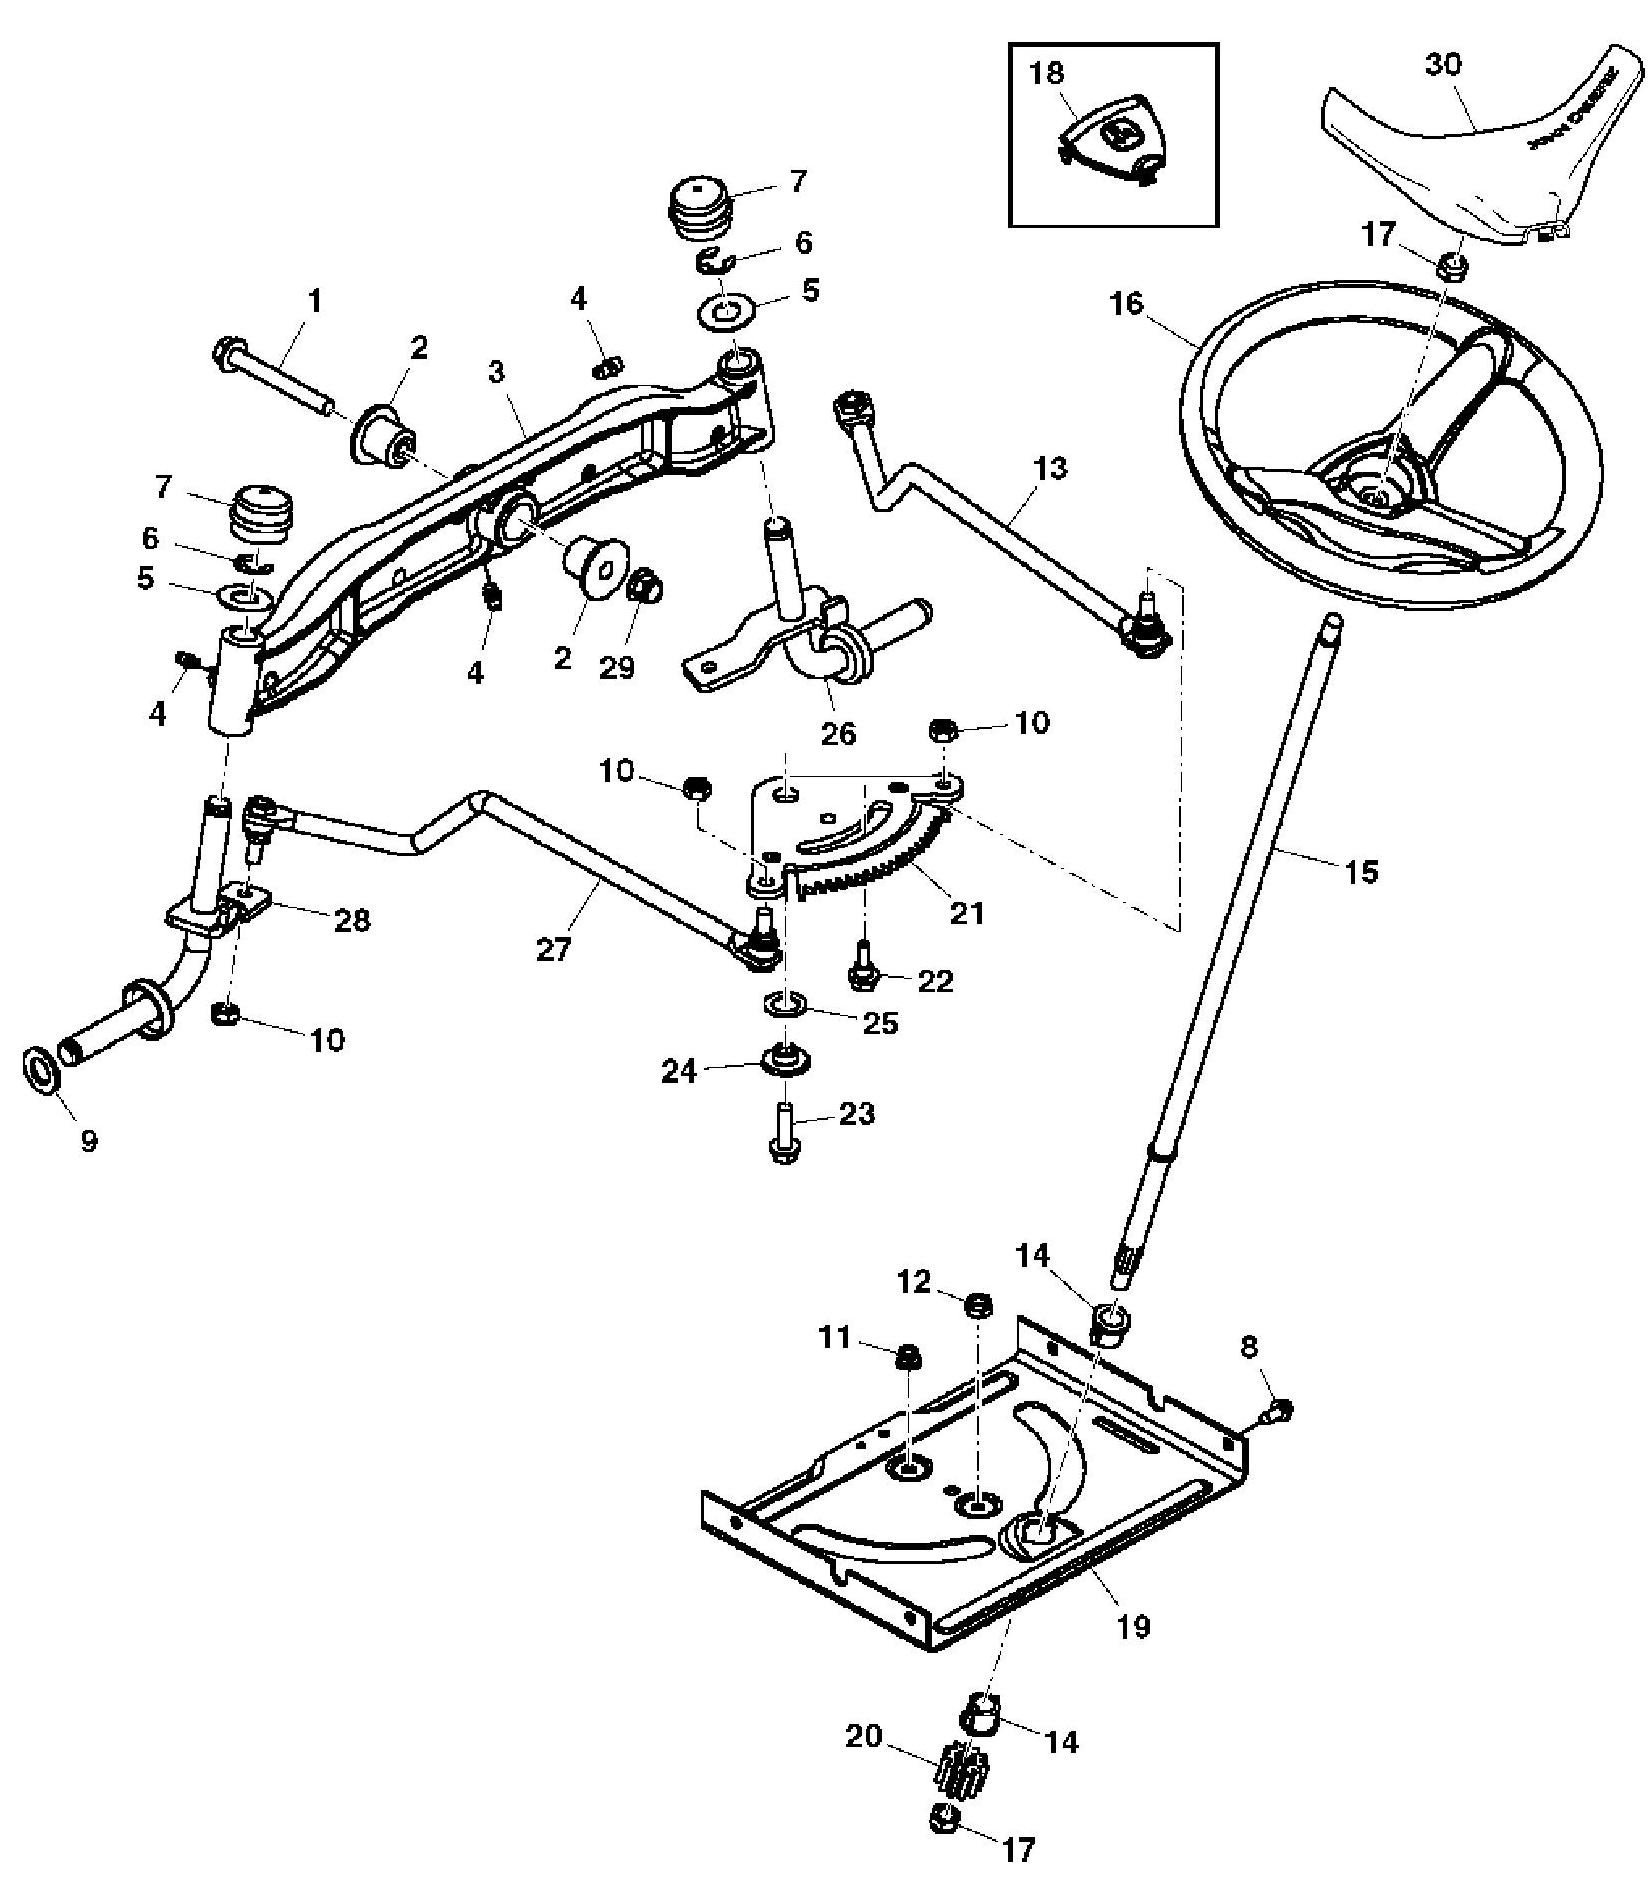 John Deere L130 Engine Diagram X140 Garden Tractor Spare